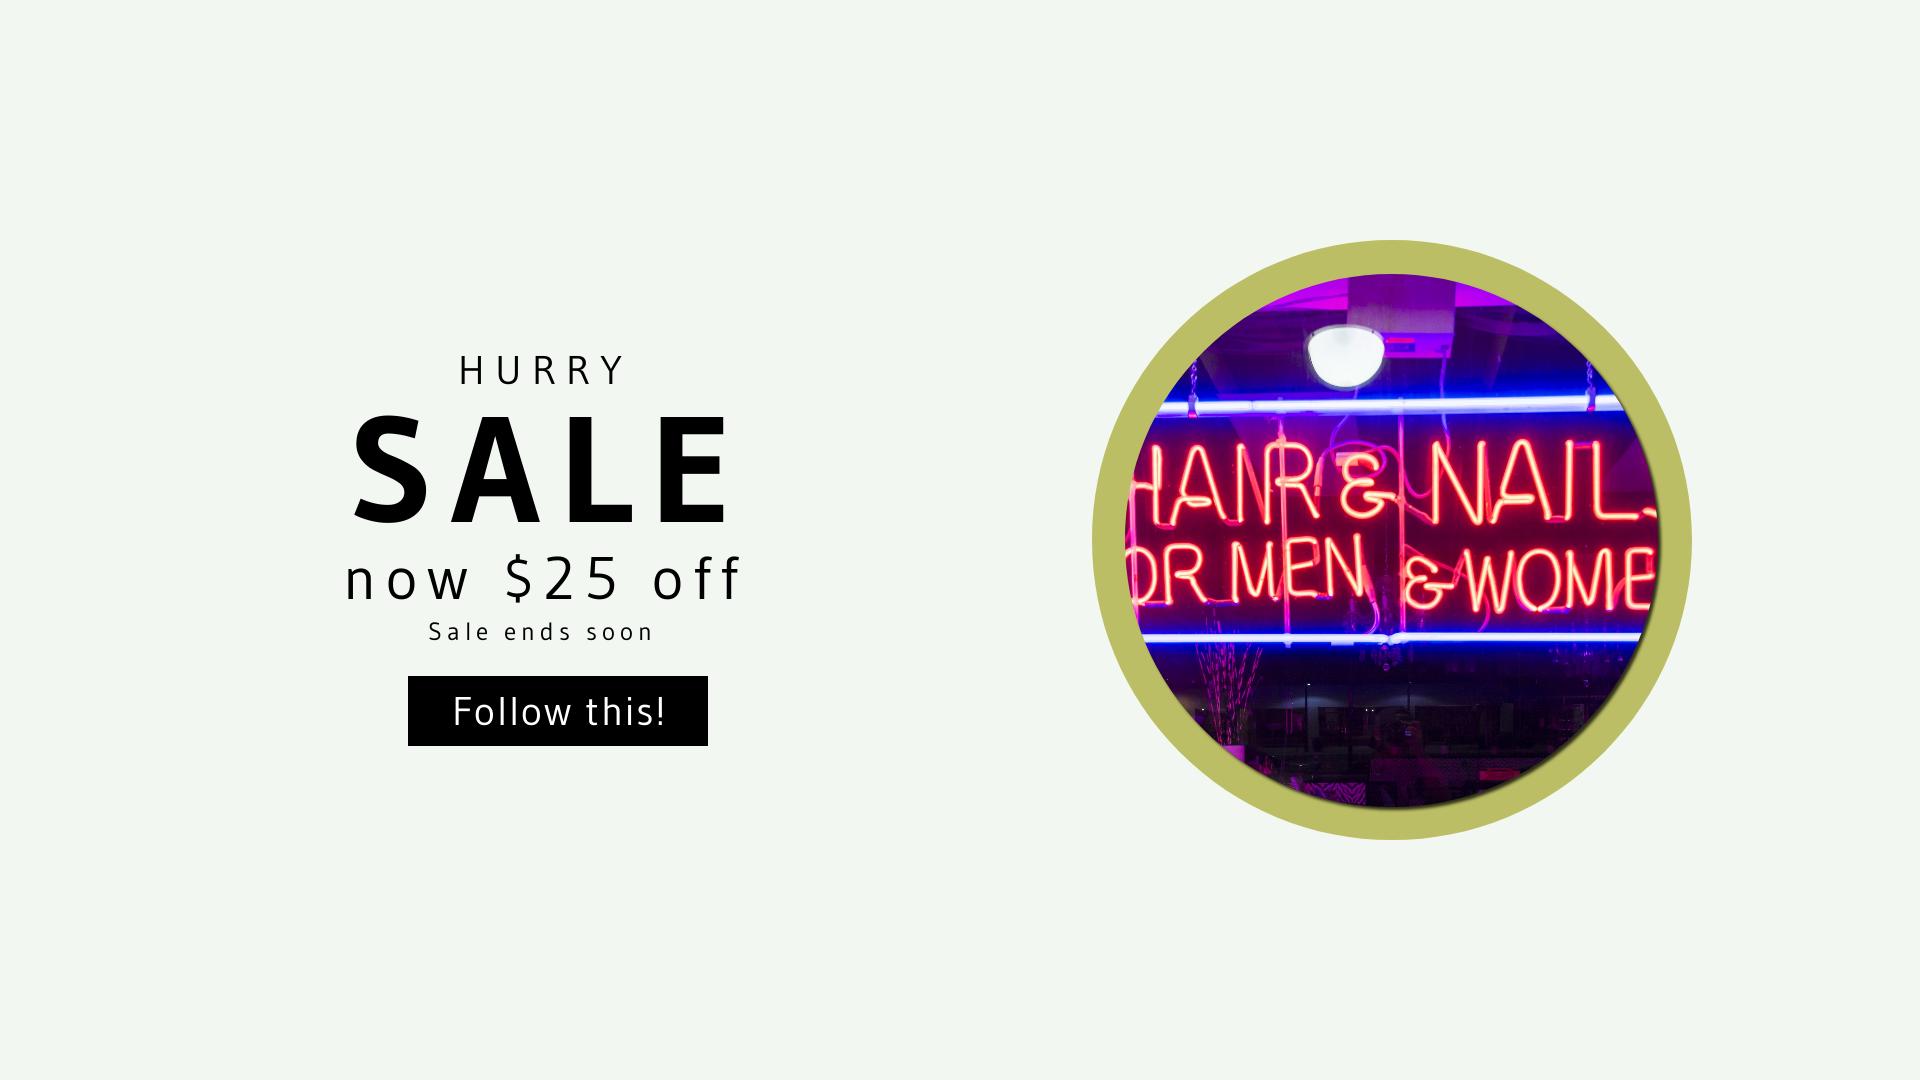 Neon, Beauty, Salon, Sign, Lights, Nails, Hair, Banner, Businnes, Sales, CallToAction, Salesbanner, White,  Free Image